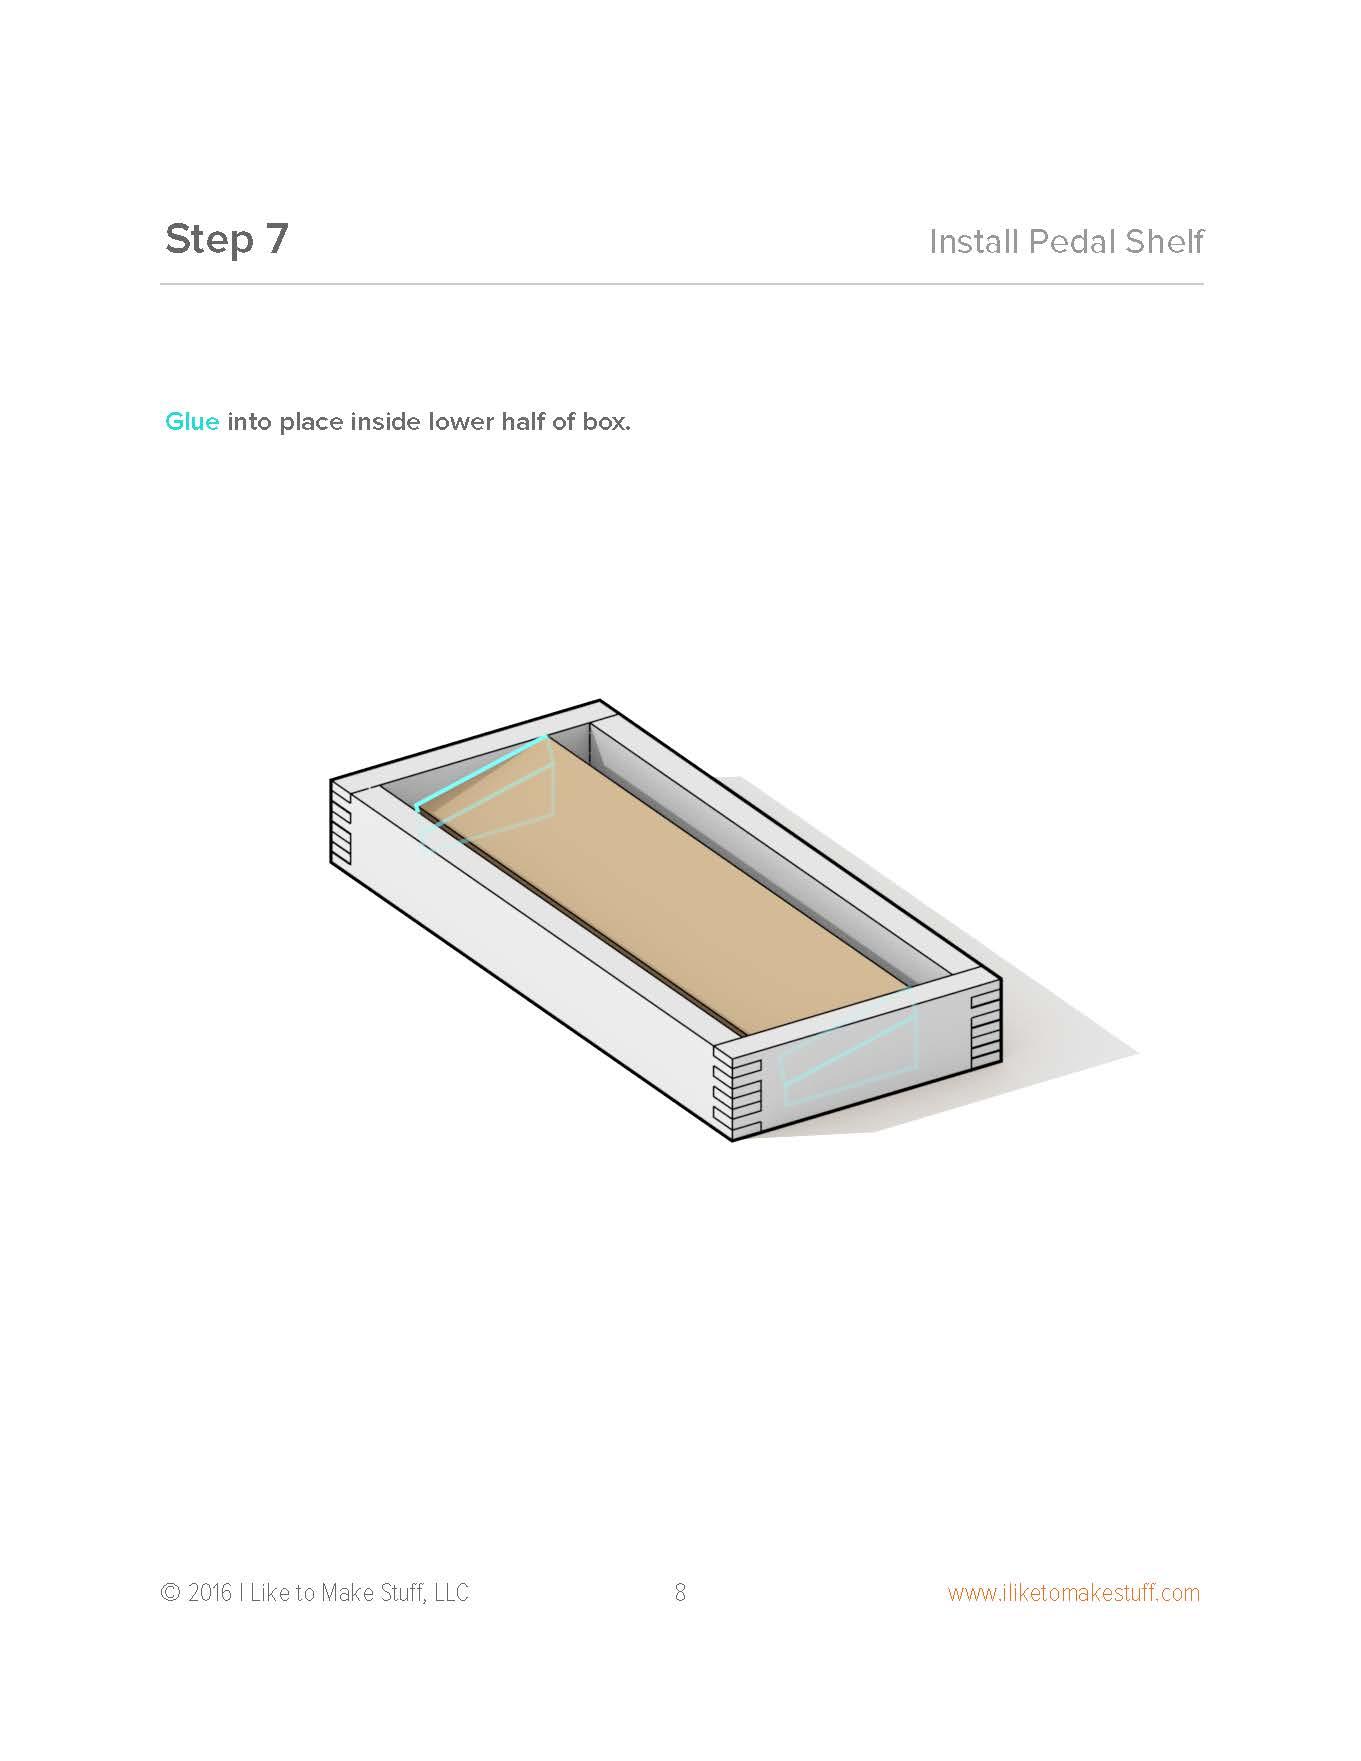 Small Pedalboard - Digital Plan - I Like to Make Stuff